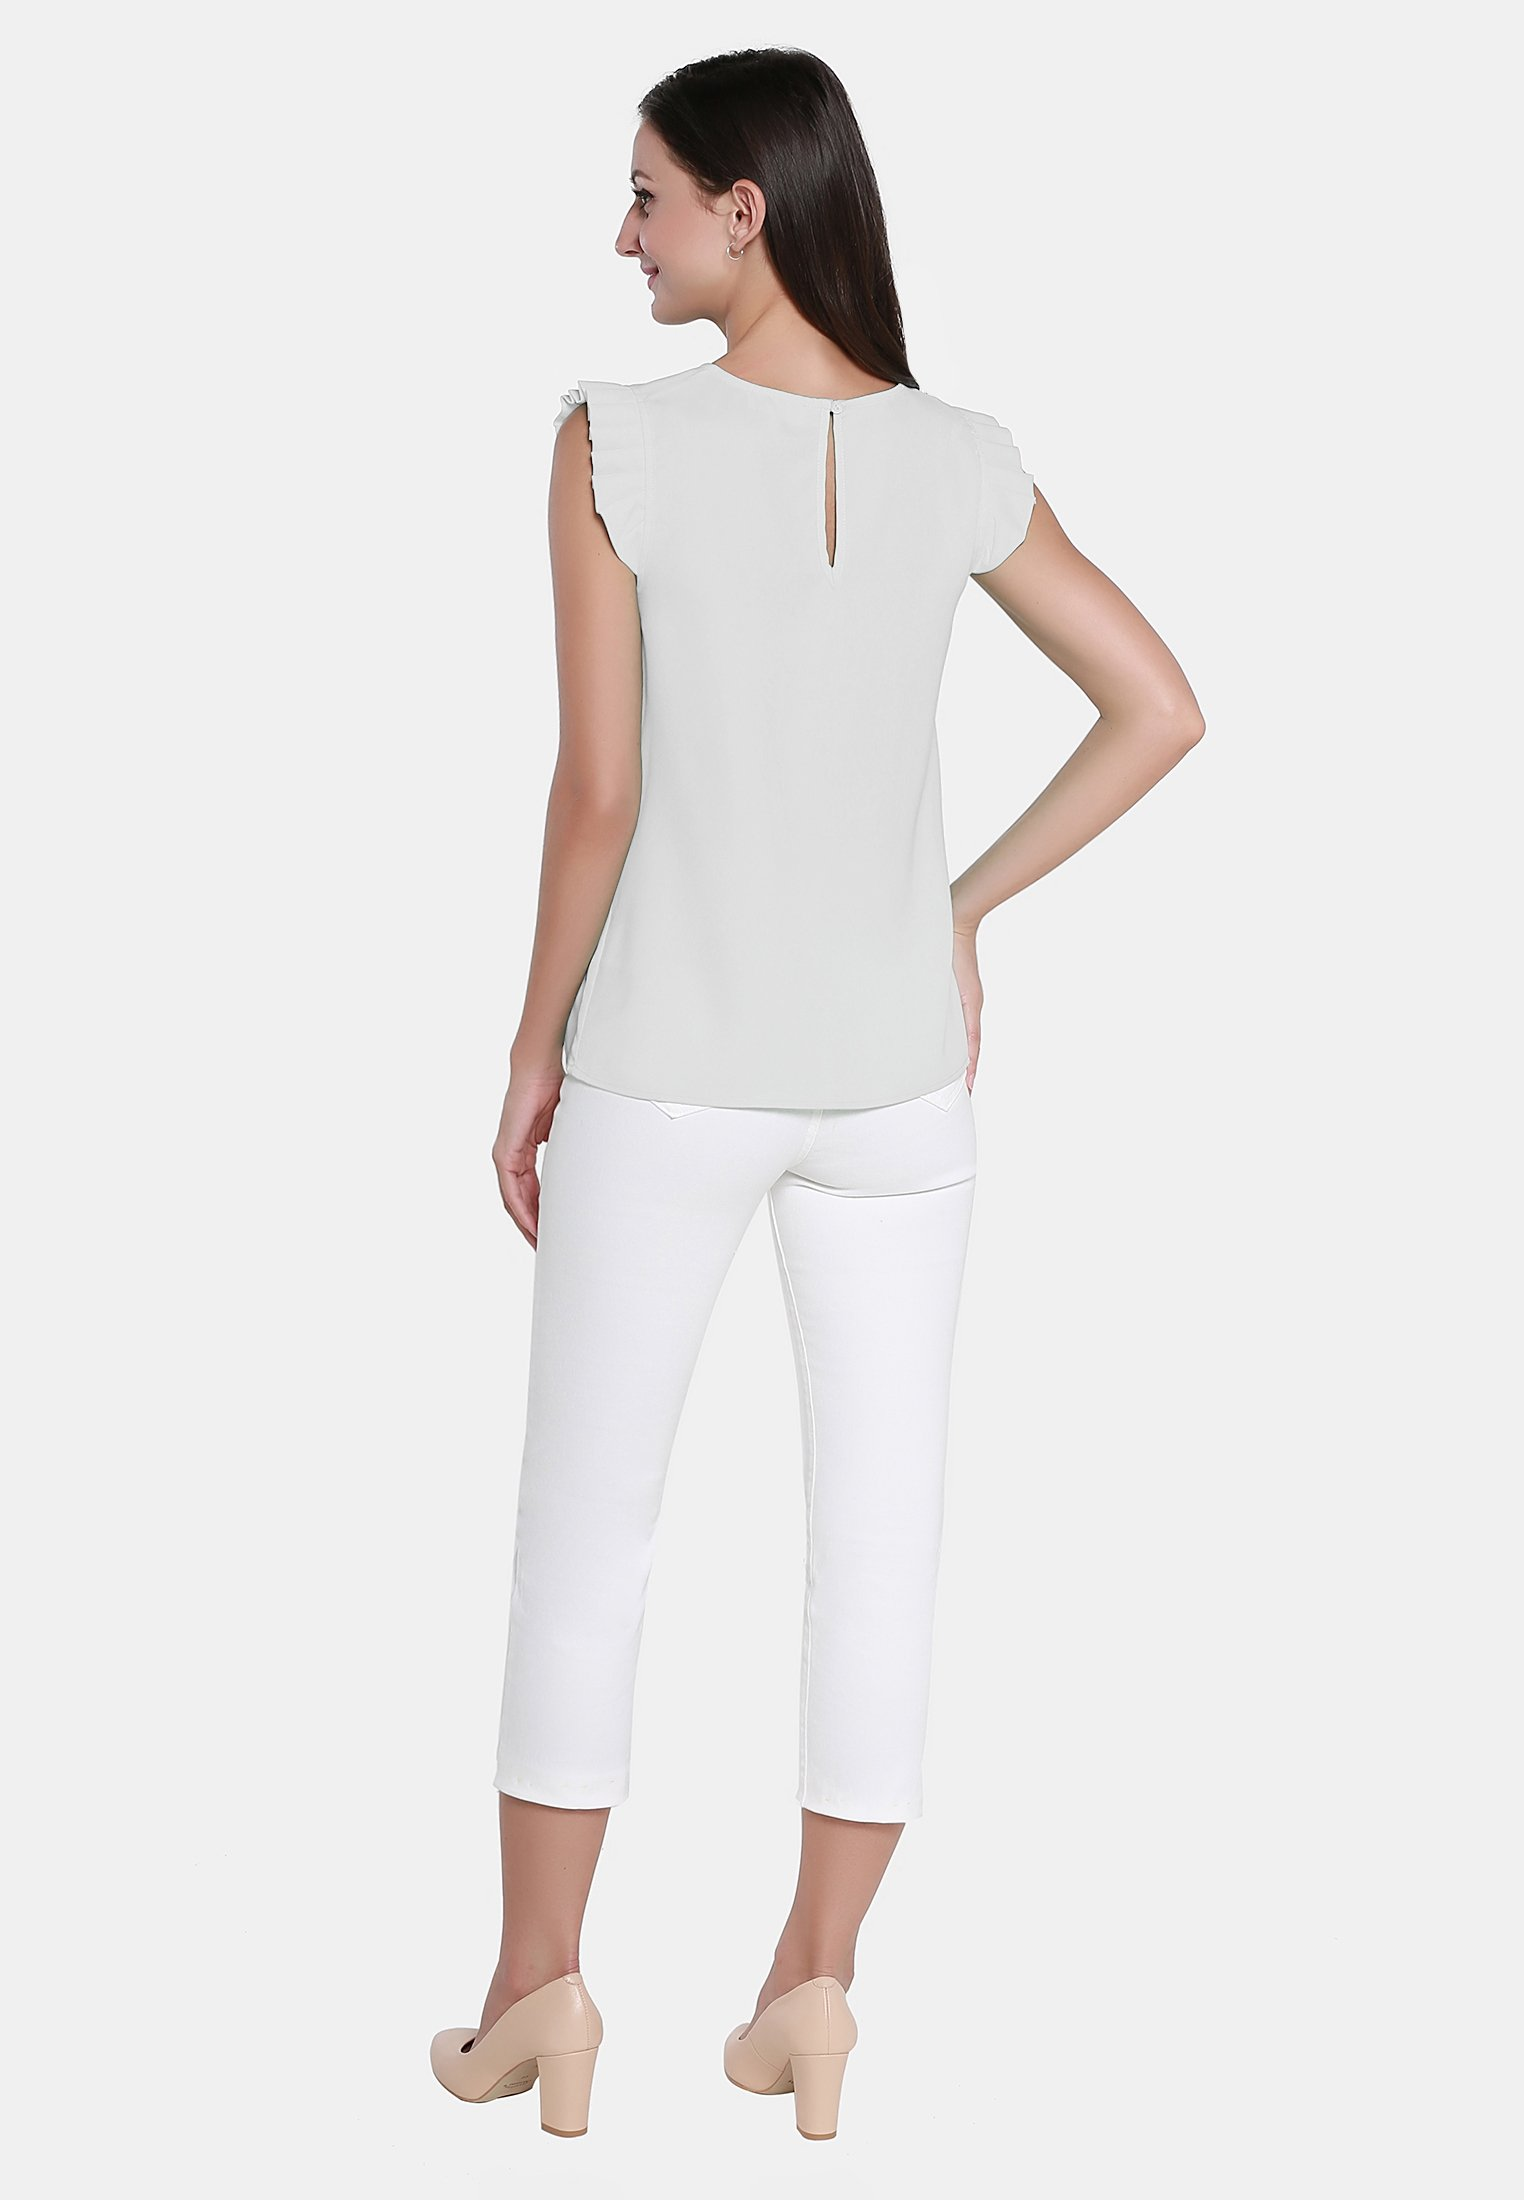 usha TOP - Débardeur - wollweiss - Tops & T-shirts Femme 6mf09